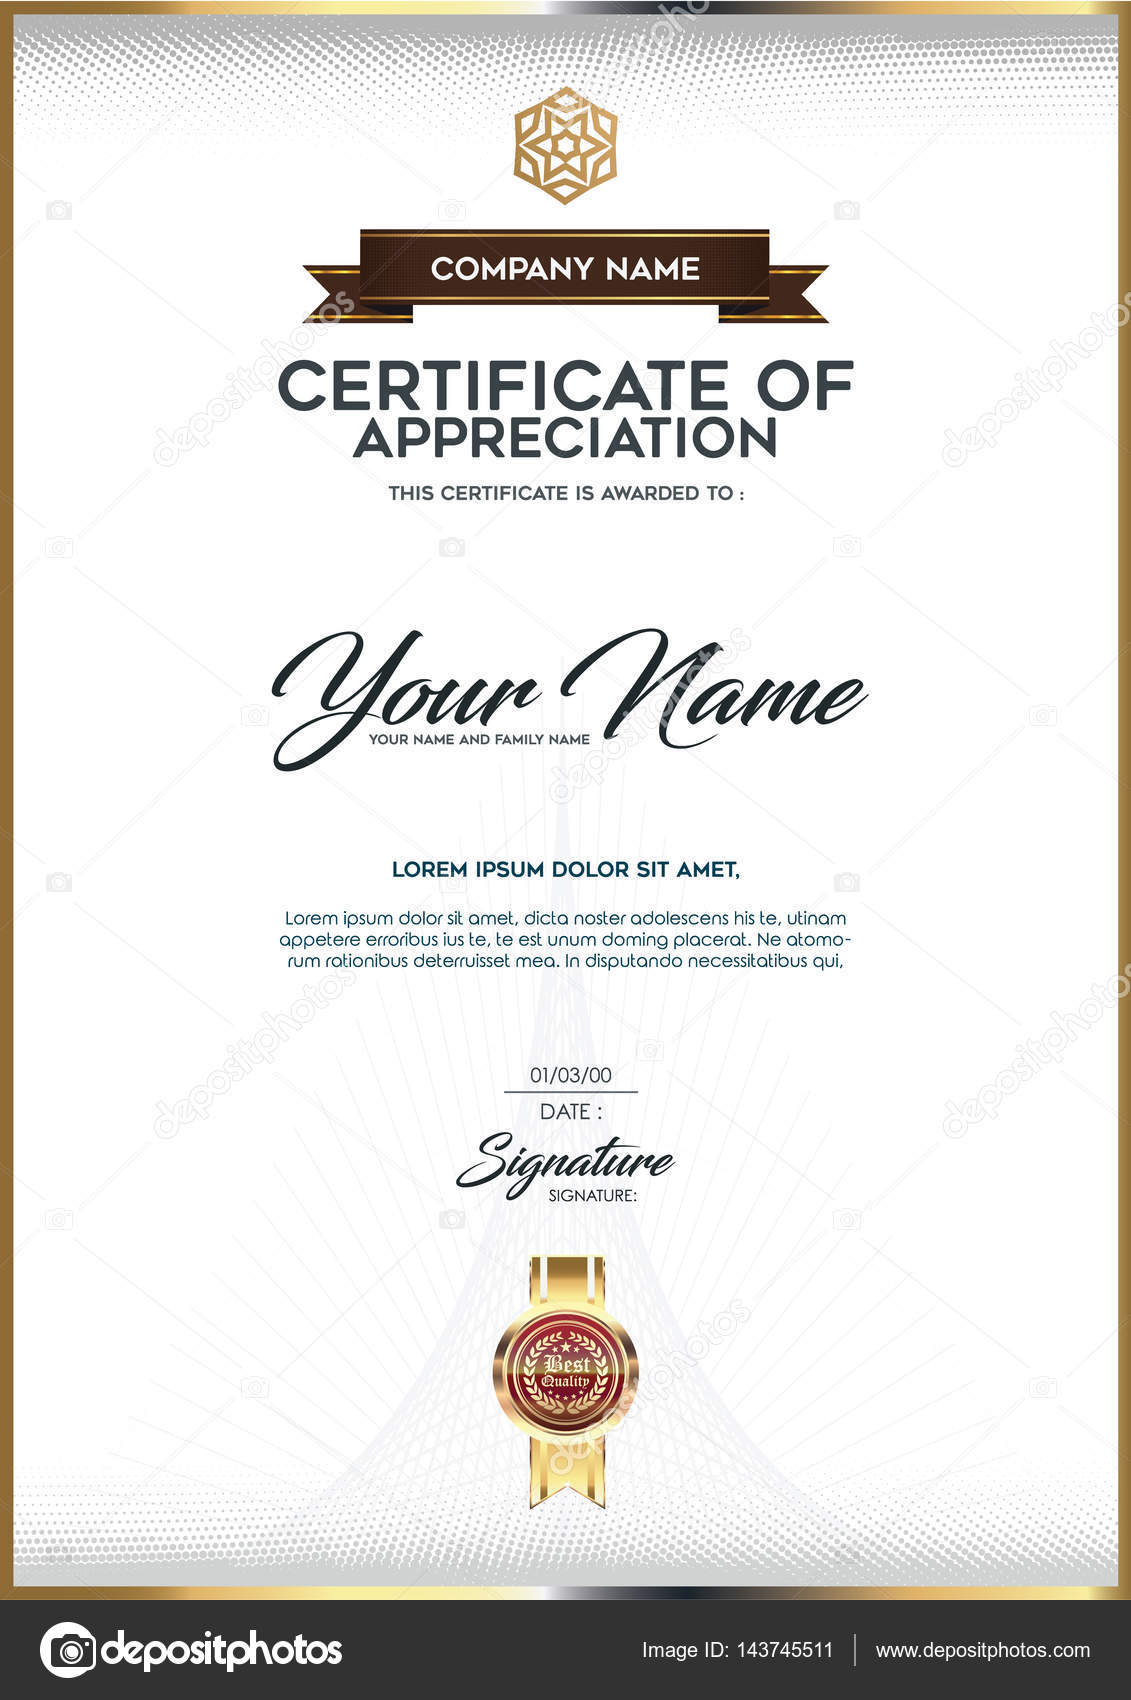 Vektor Luxus Zertifikatvorlage — Stockvektor © PhaisarnWong #143745511